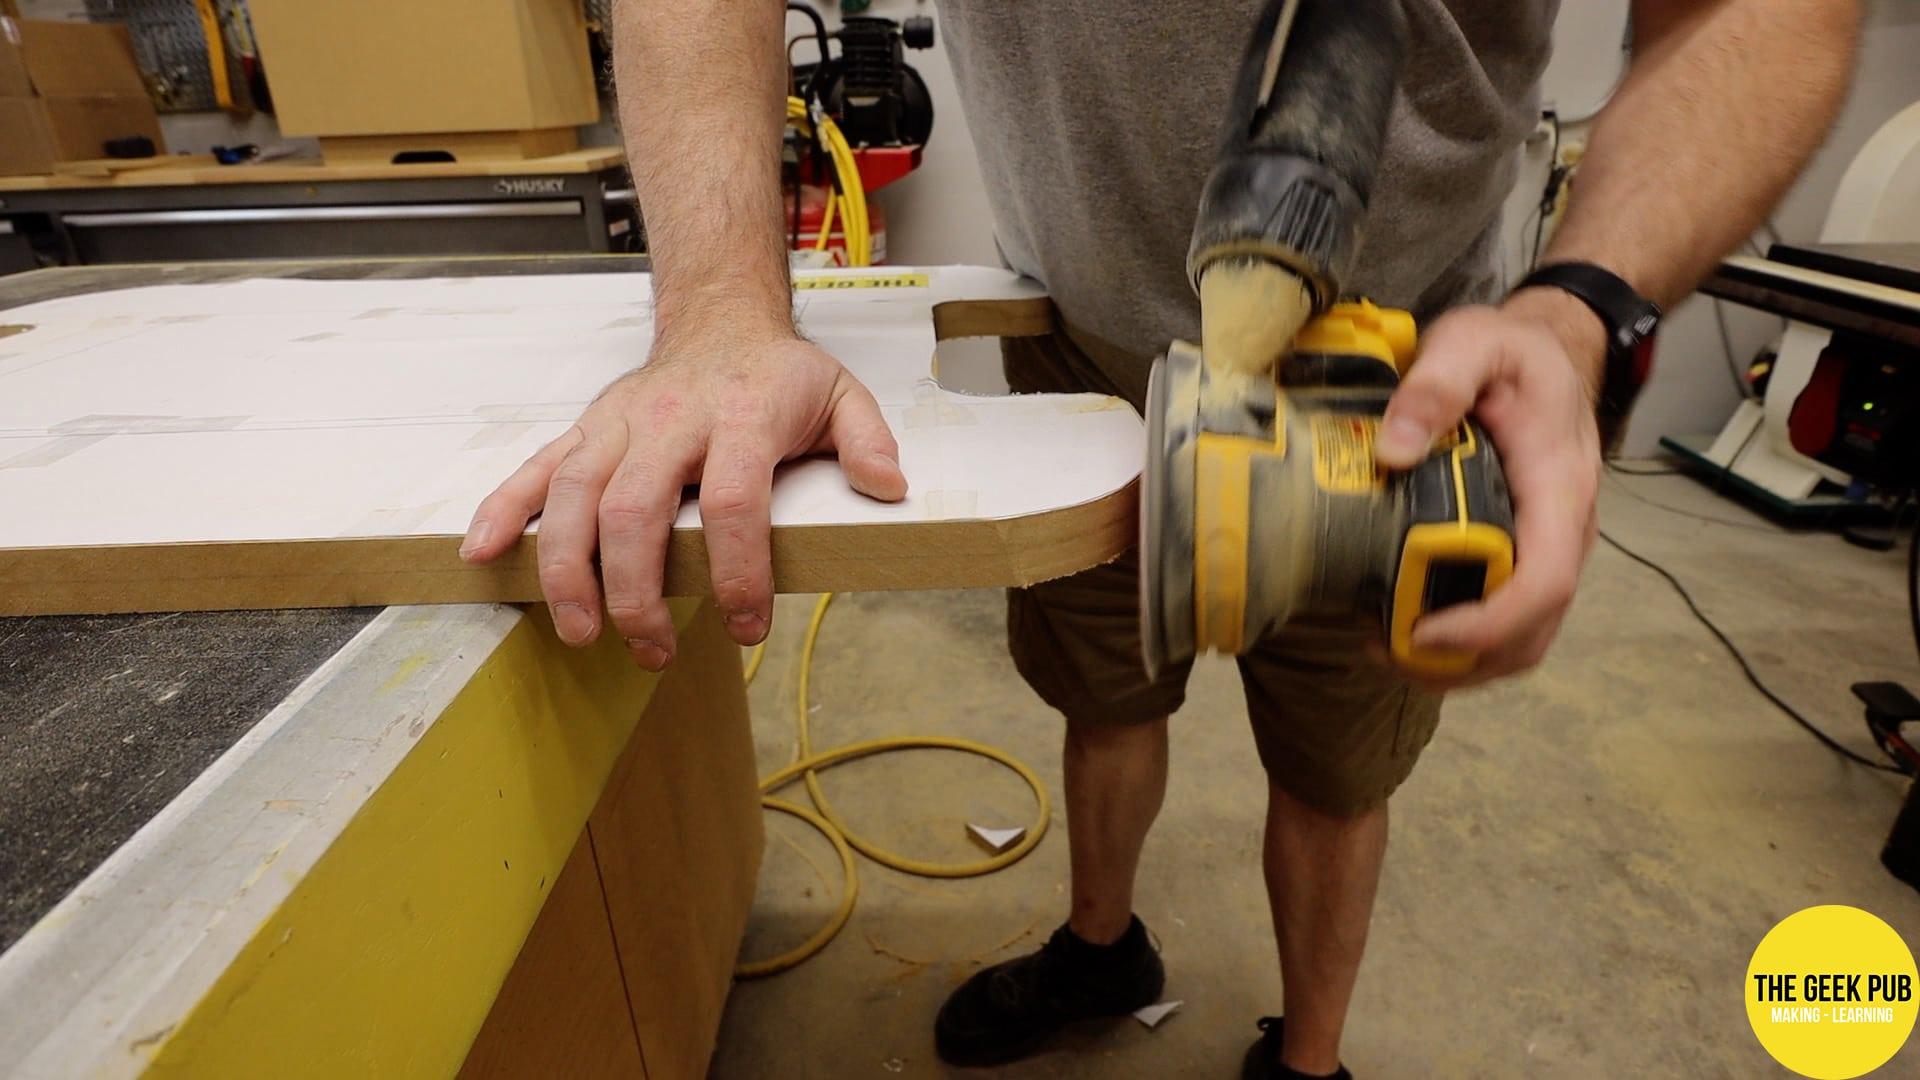 Tabletop sanding